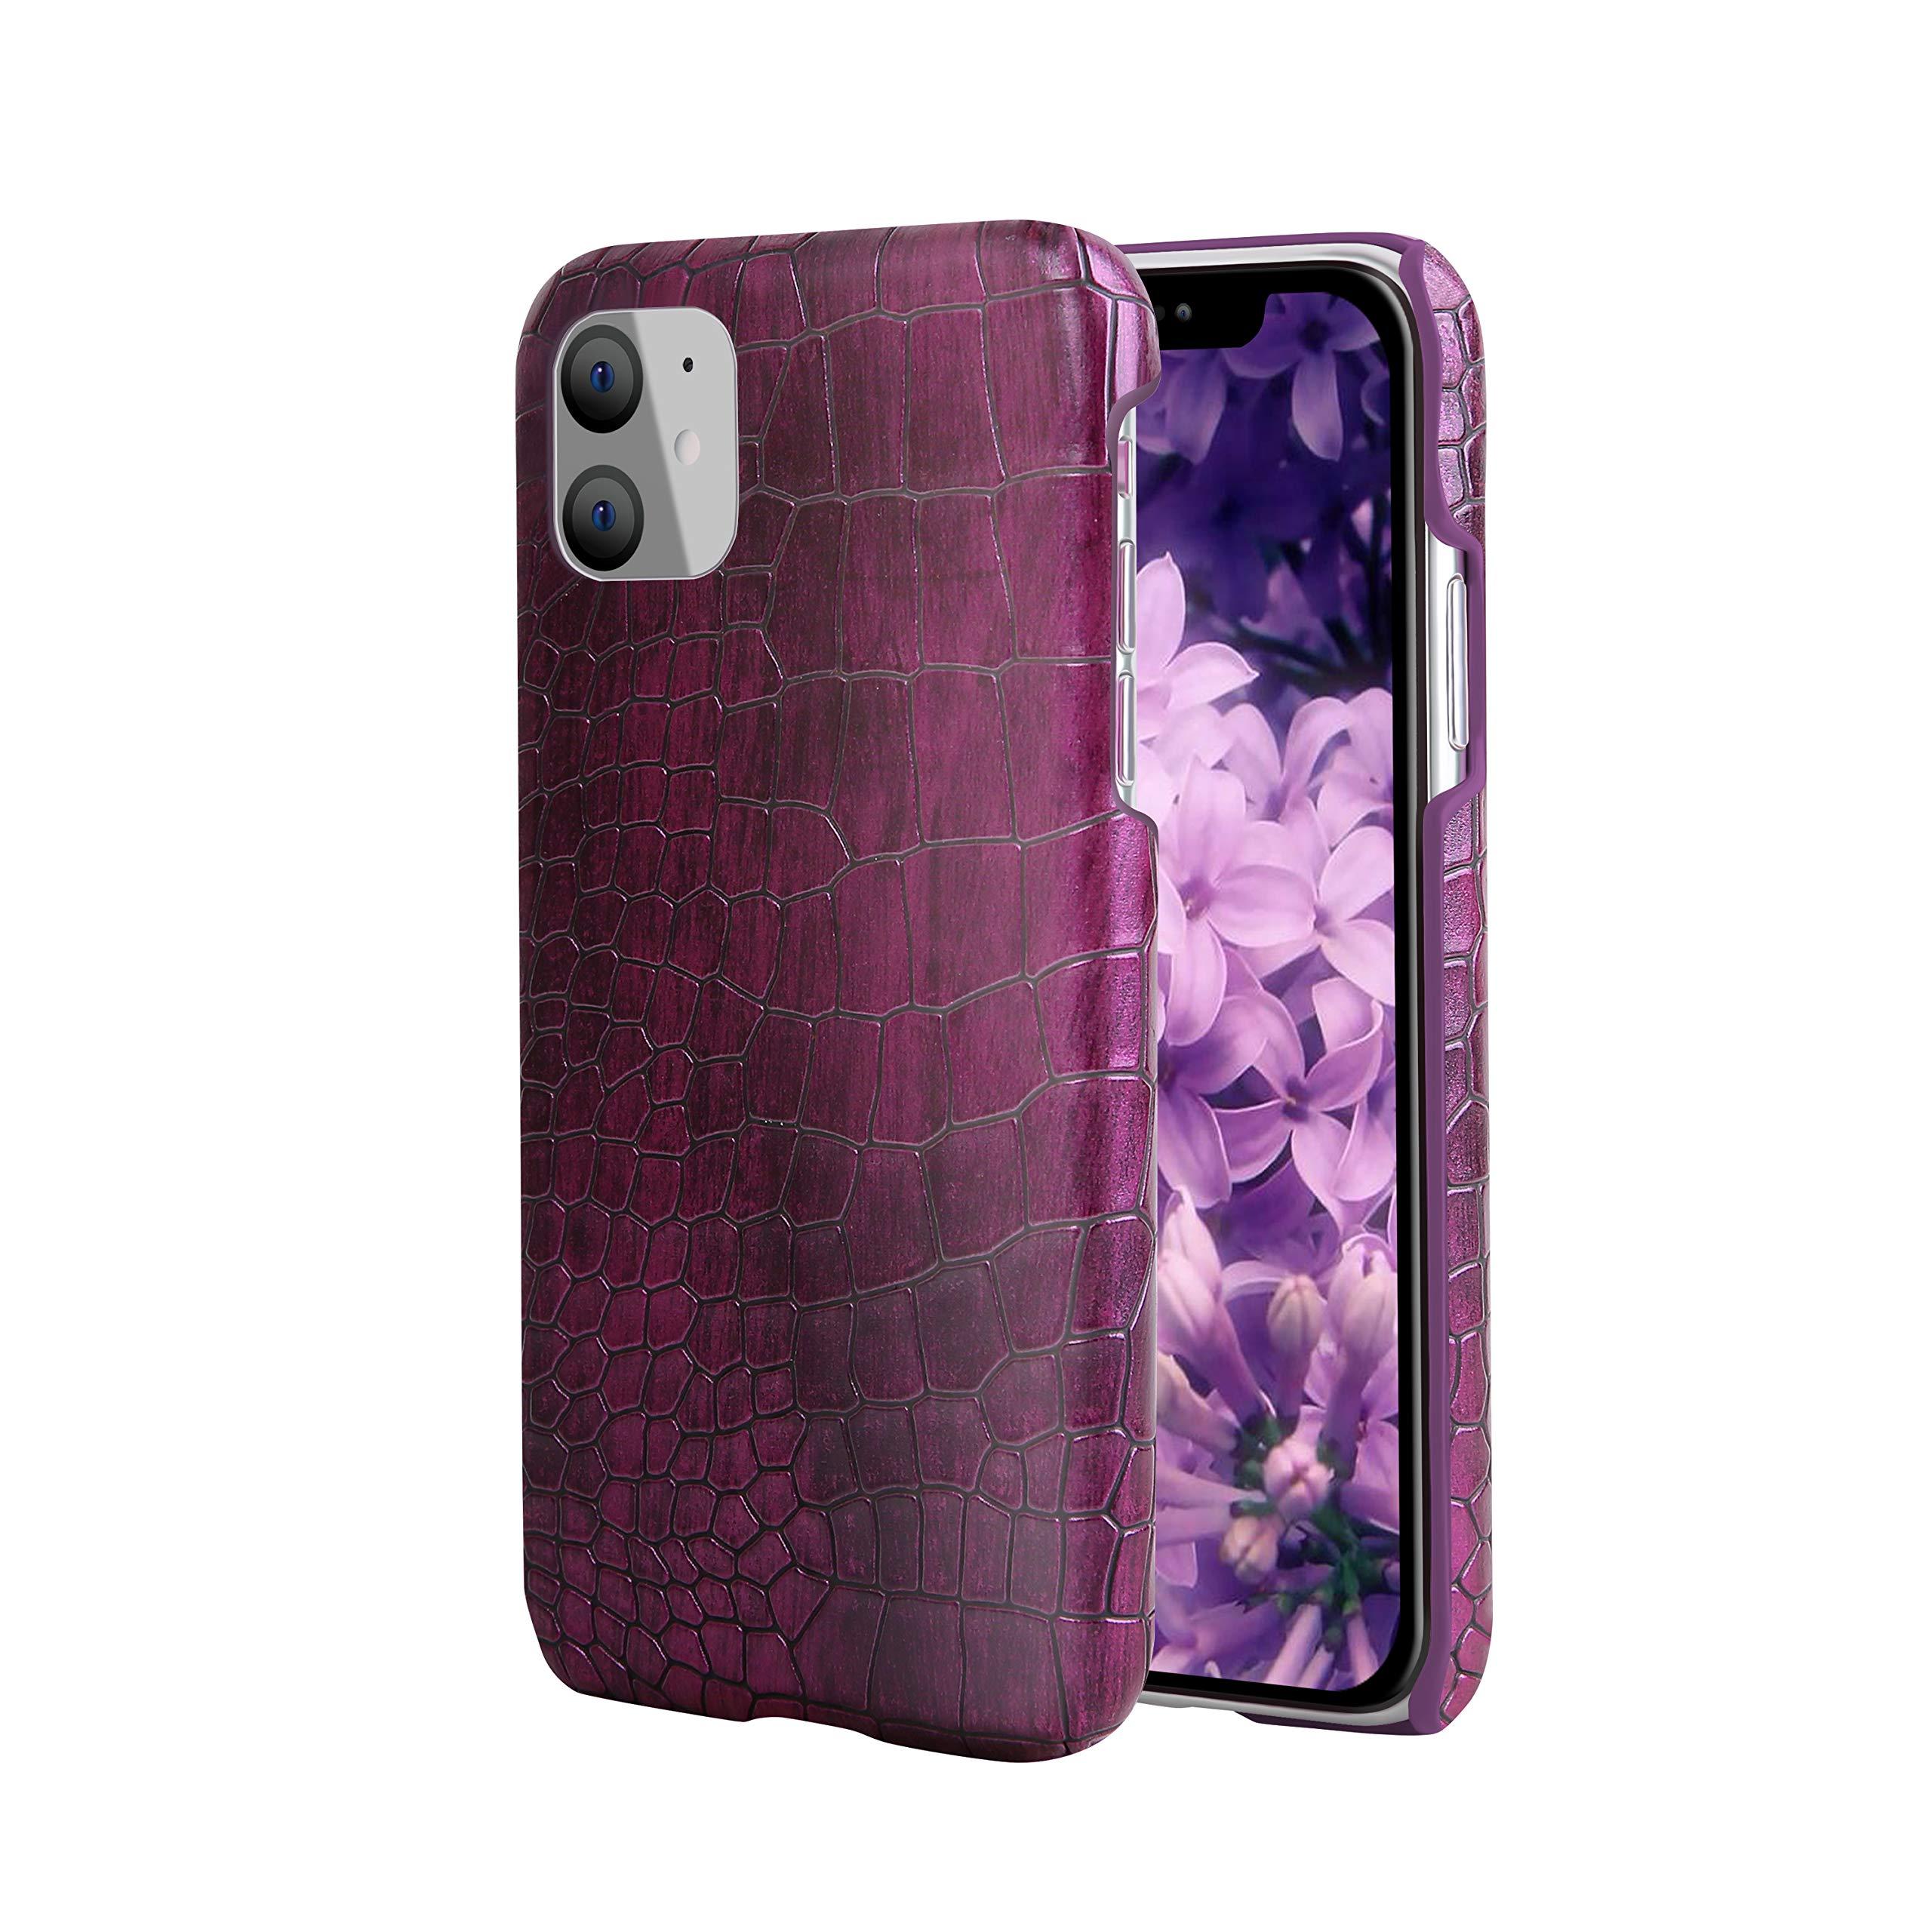 iPhone 11 Pro Max Case, Premium Genuine Leather Case, Stylish Crocodile Pattern Anti-Slip Hard Shell Phone Protective Cover Compatible with iPhone 11 6.2 inch [2019] [Crocodile Purple]